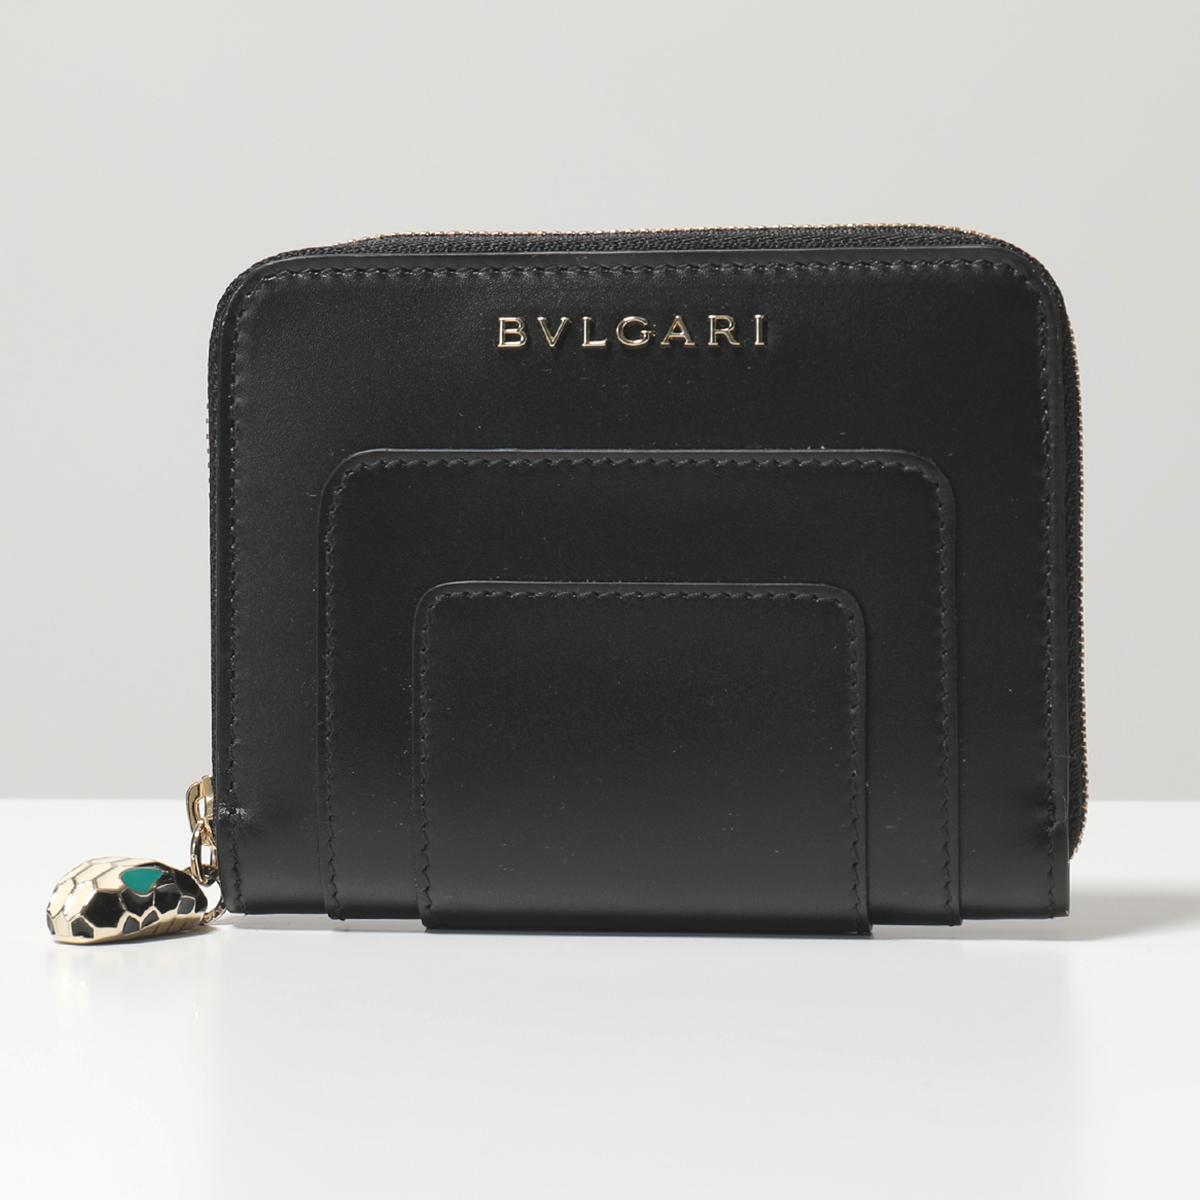 BVLGARI ブルガリ 280375 Serpenti Forever Accessories レザー ラウンドファスナーミニ財布 ジップチャーム black/emerald-green レディース